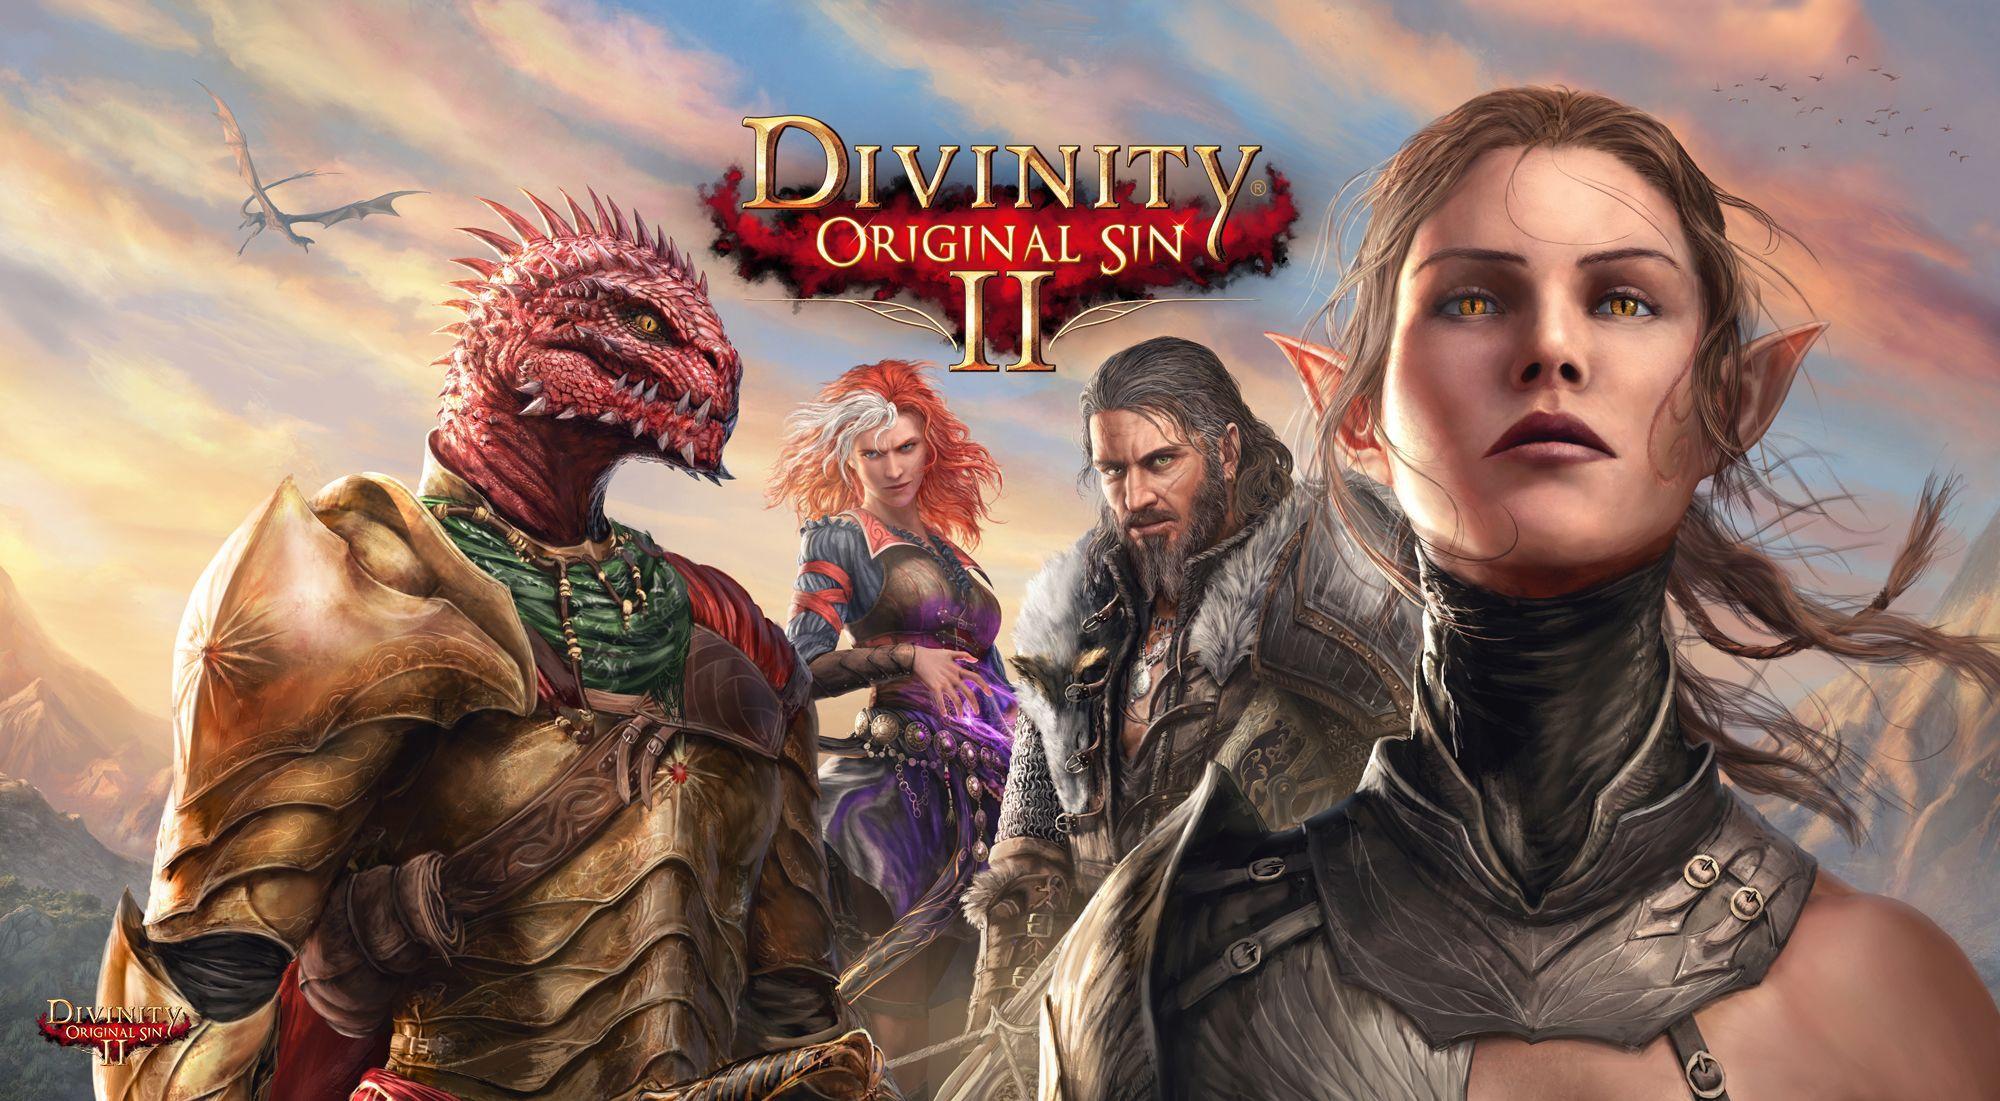 Divinity: Original Sin 2 , HD Wallpaper & Backgrounds